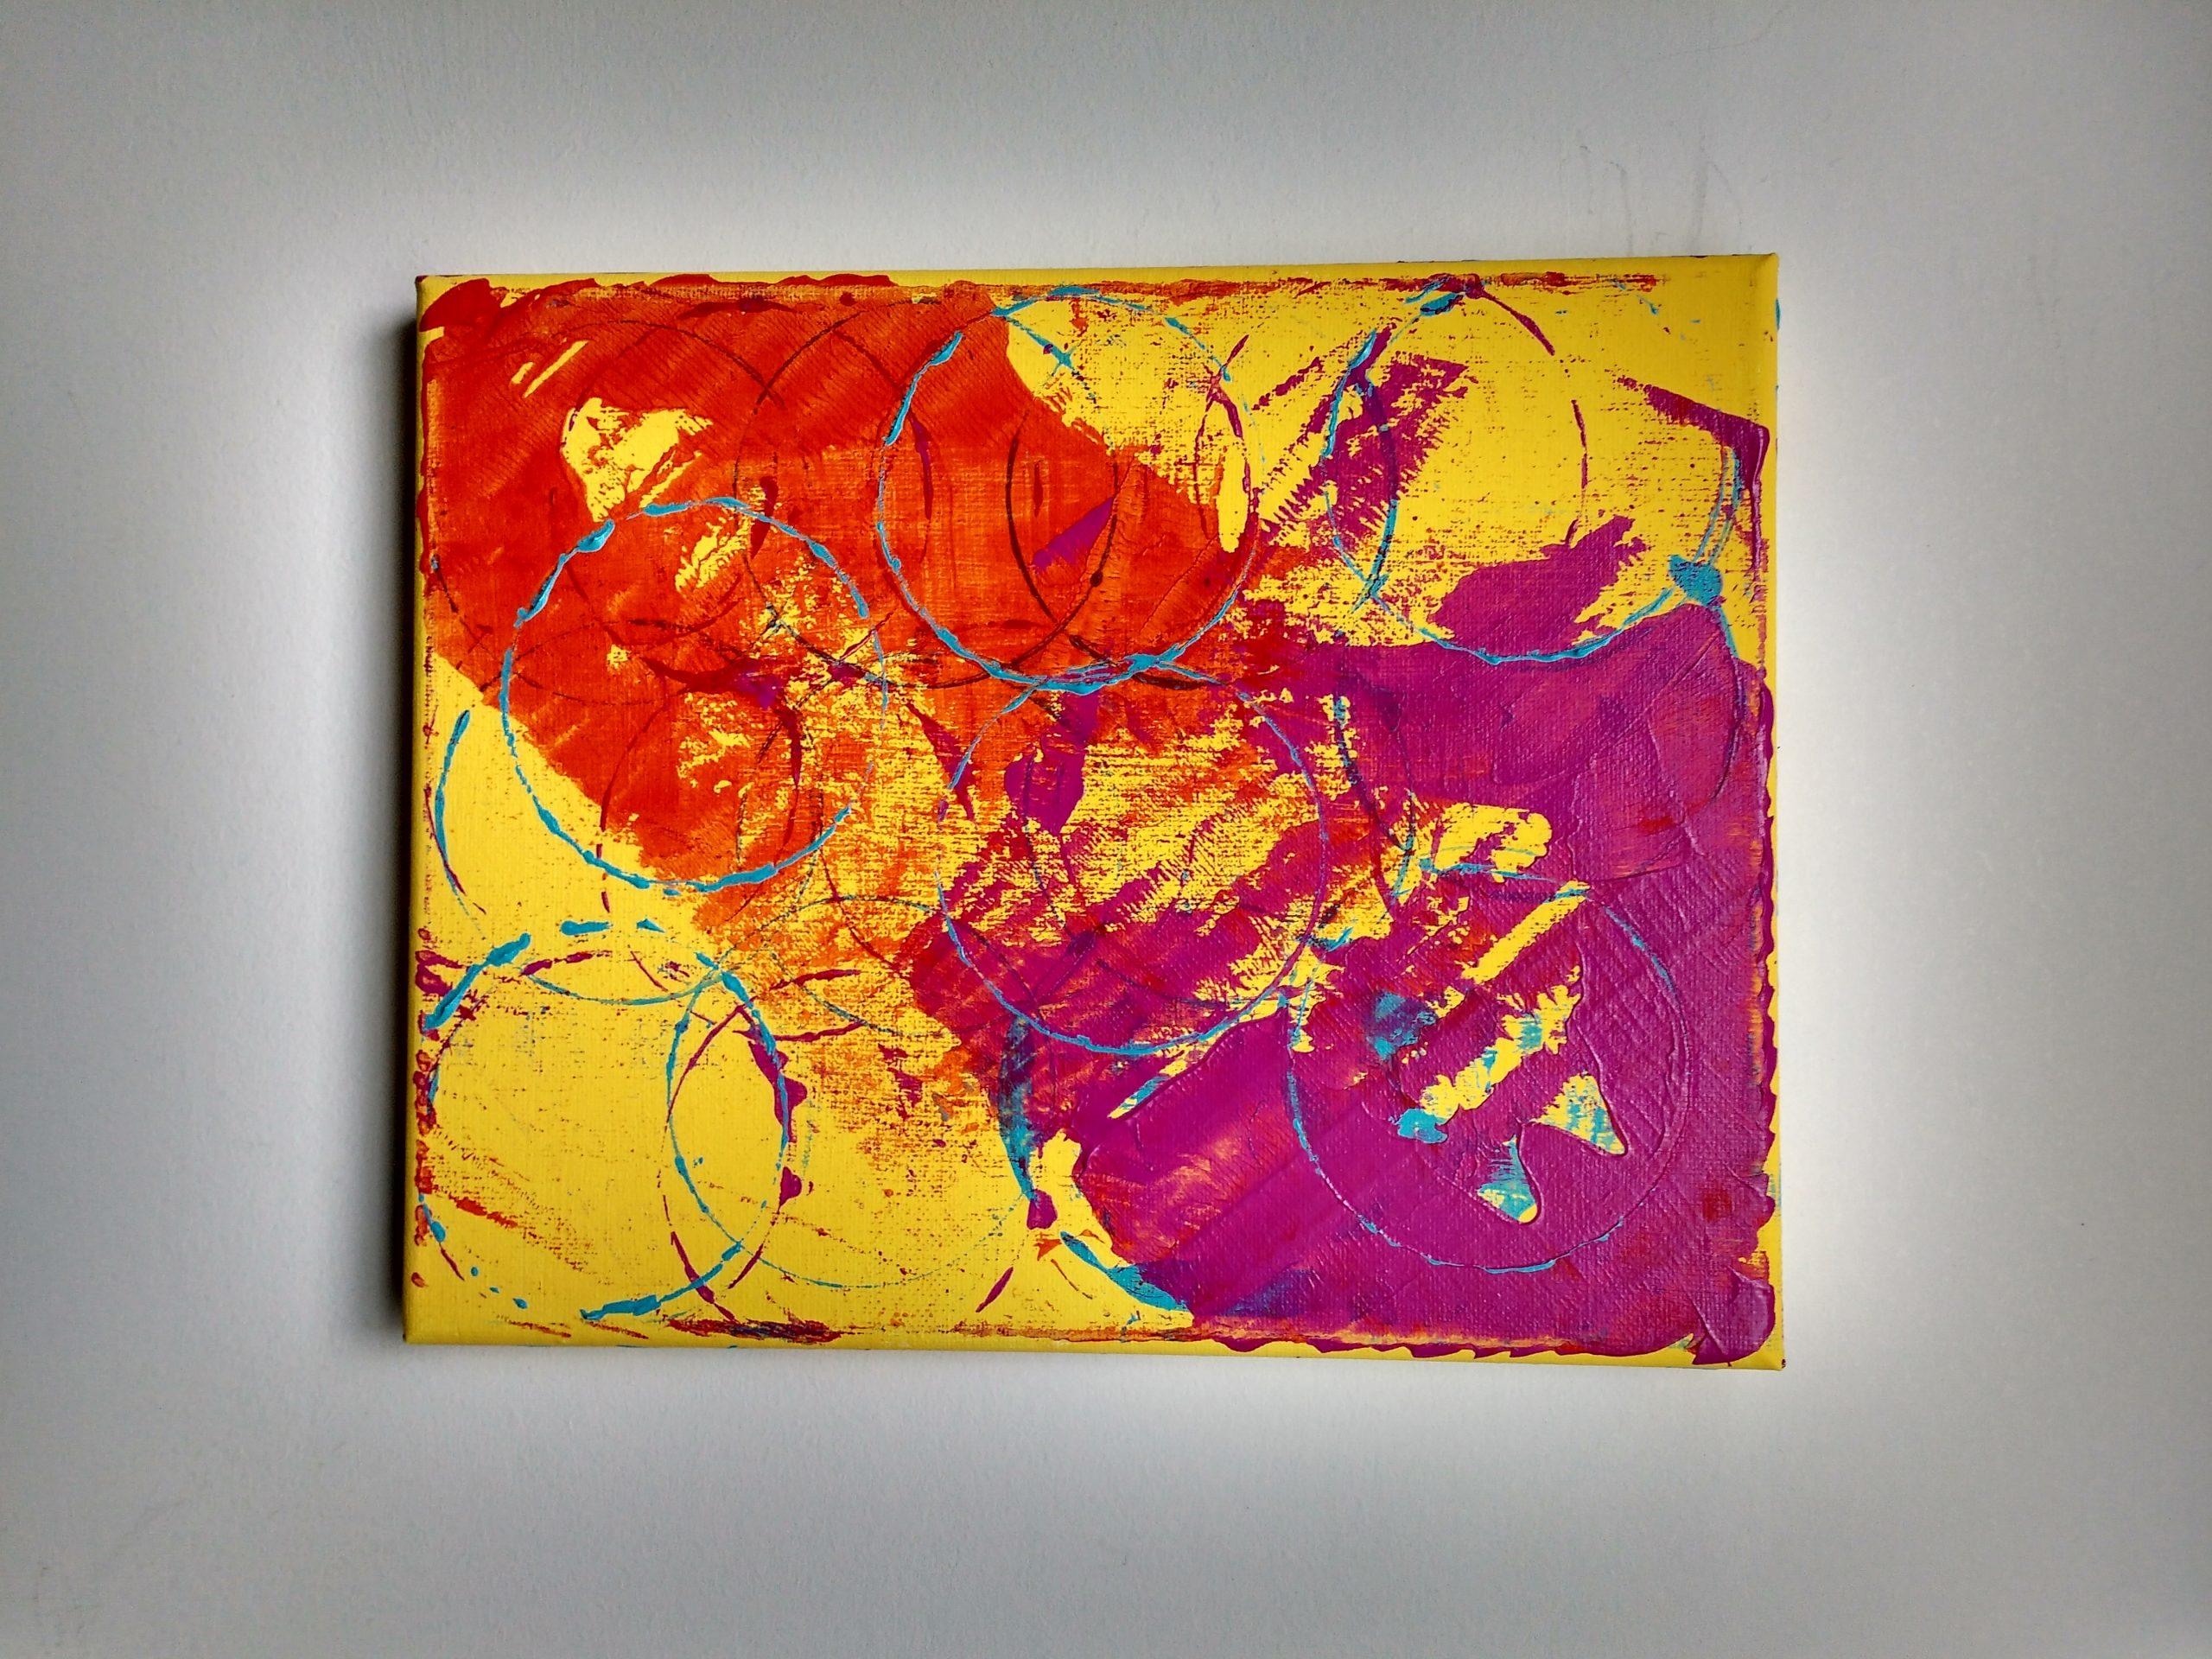 Untitled, 2019, mixed media, 8x10